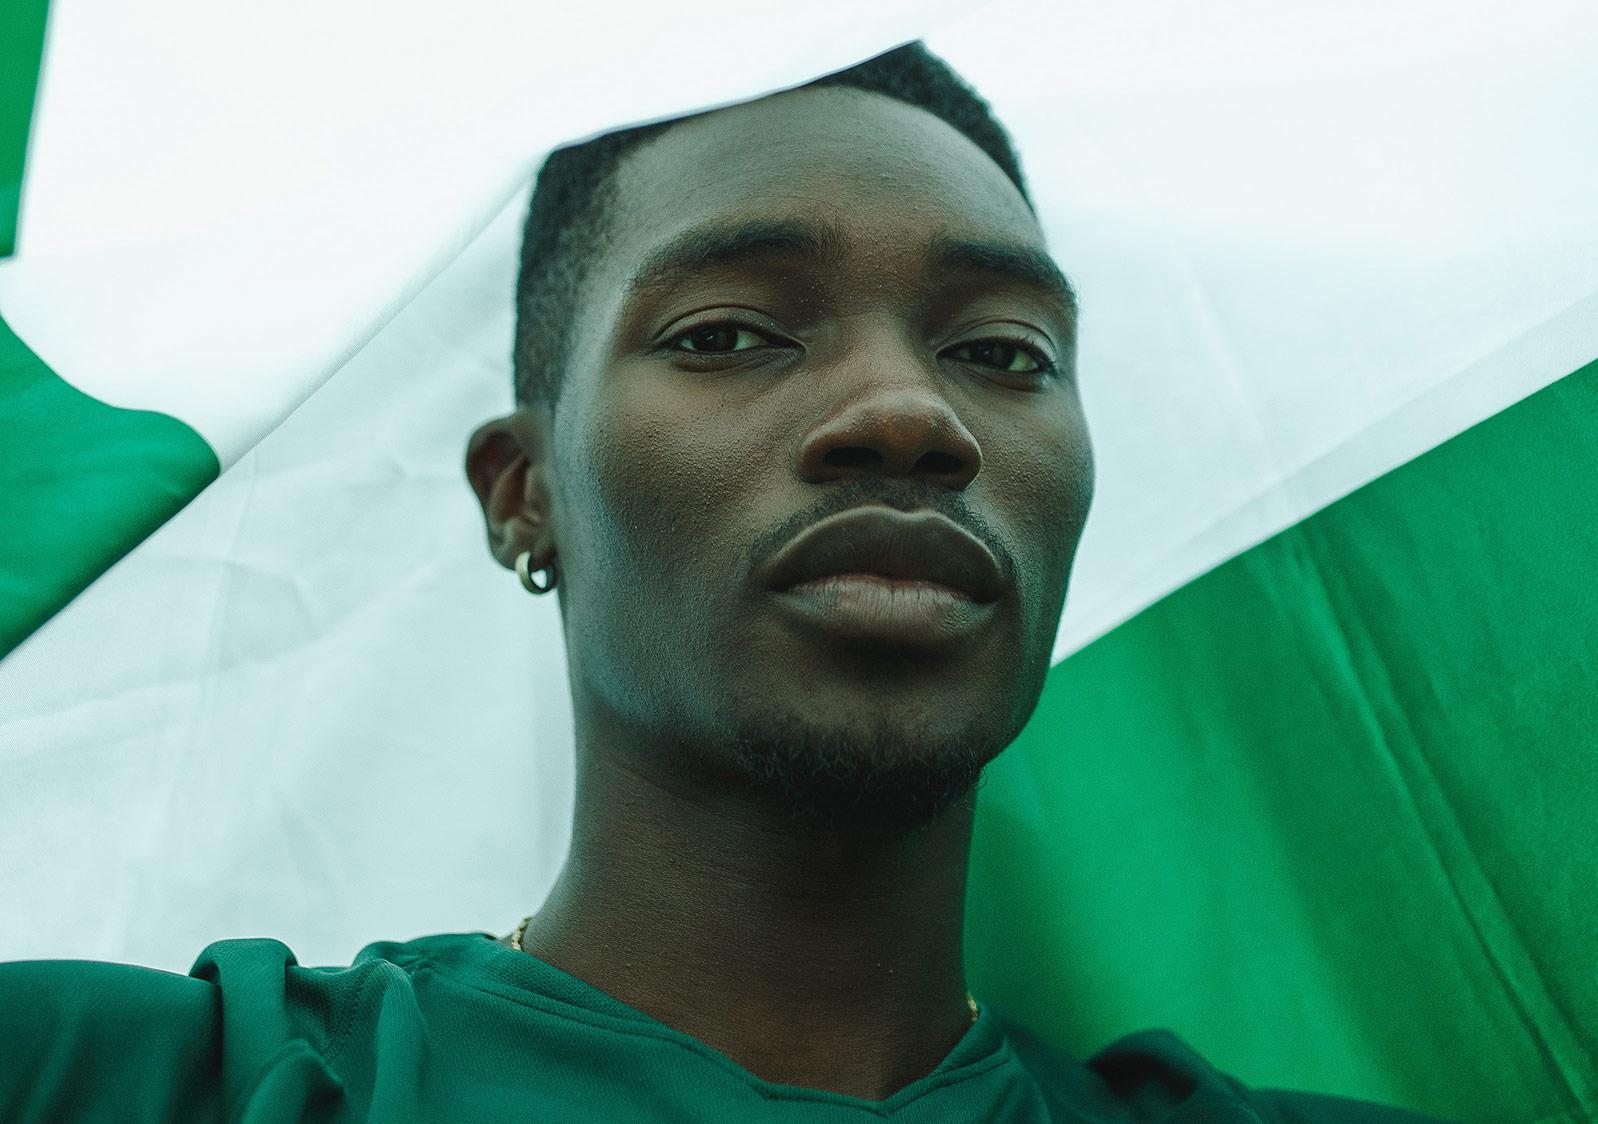 Seun Badejo, CEO and Design Lead at Eximia Design Studio, a digital design studio based in Lagos, Nigeria.